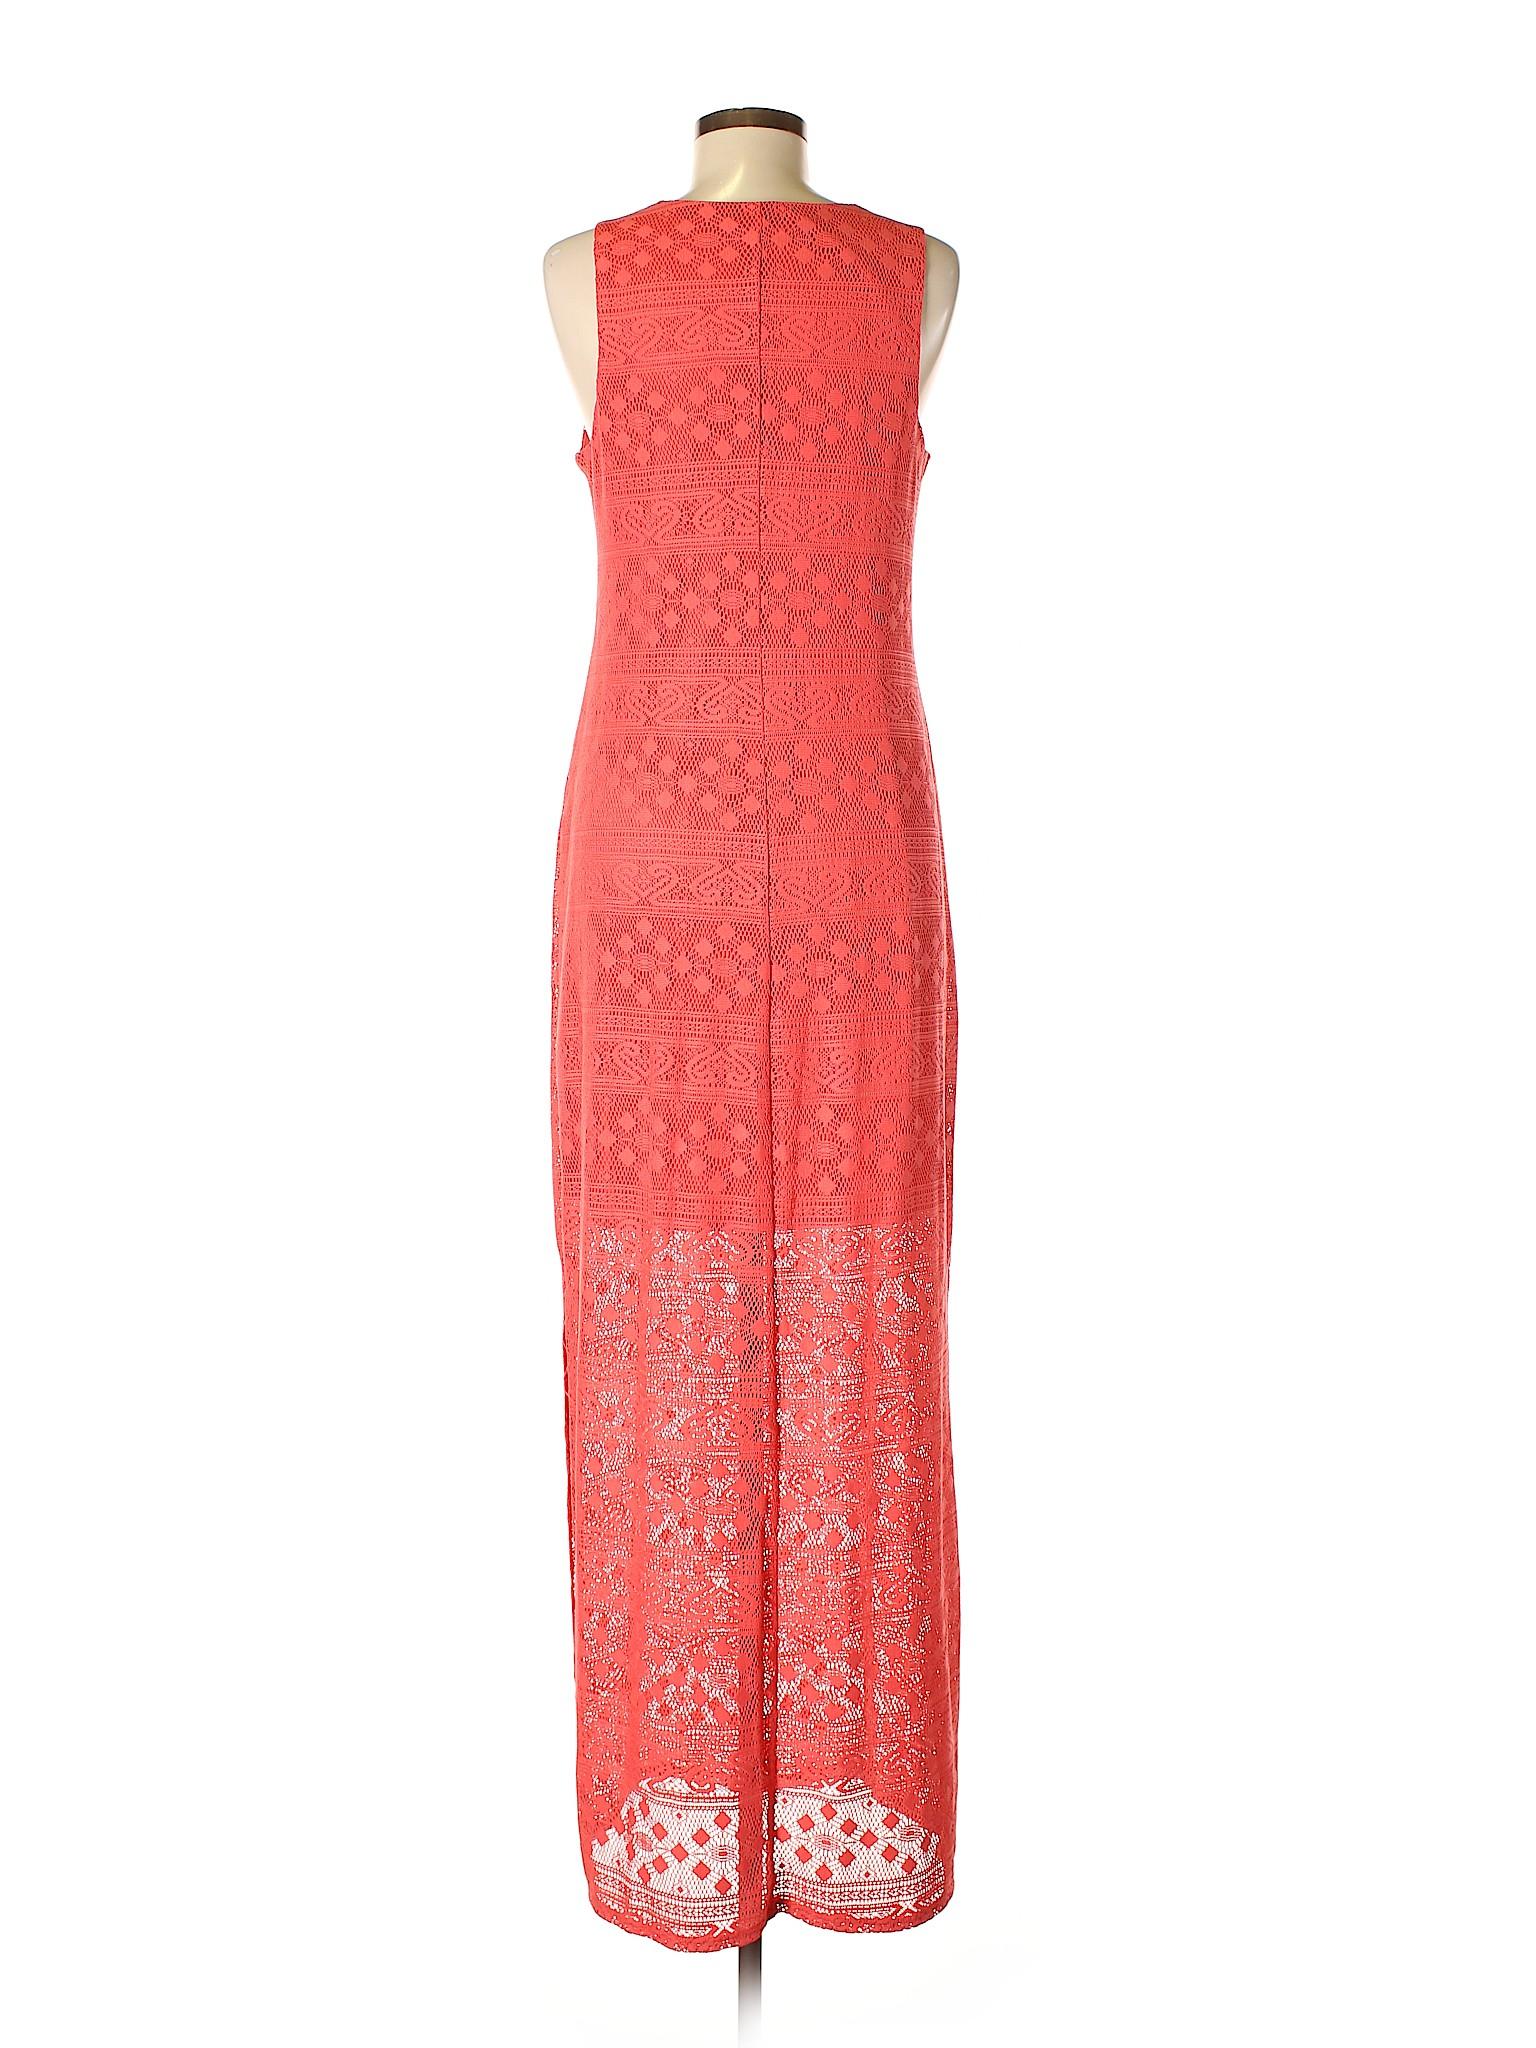 Dress Casual Boutique Xhilaration Boutique winter winter wxTYa0q77R